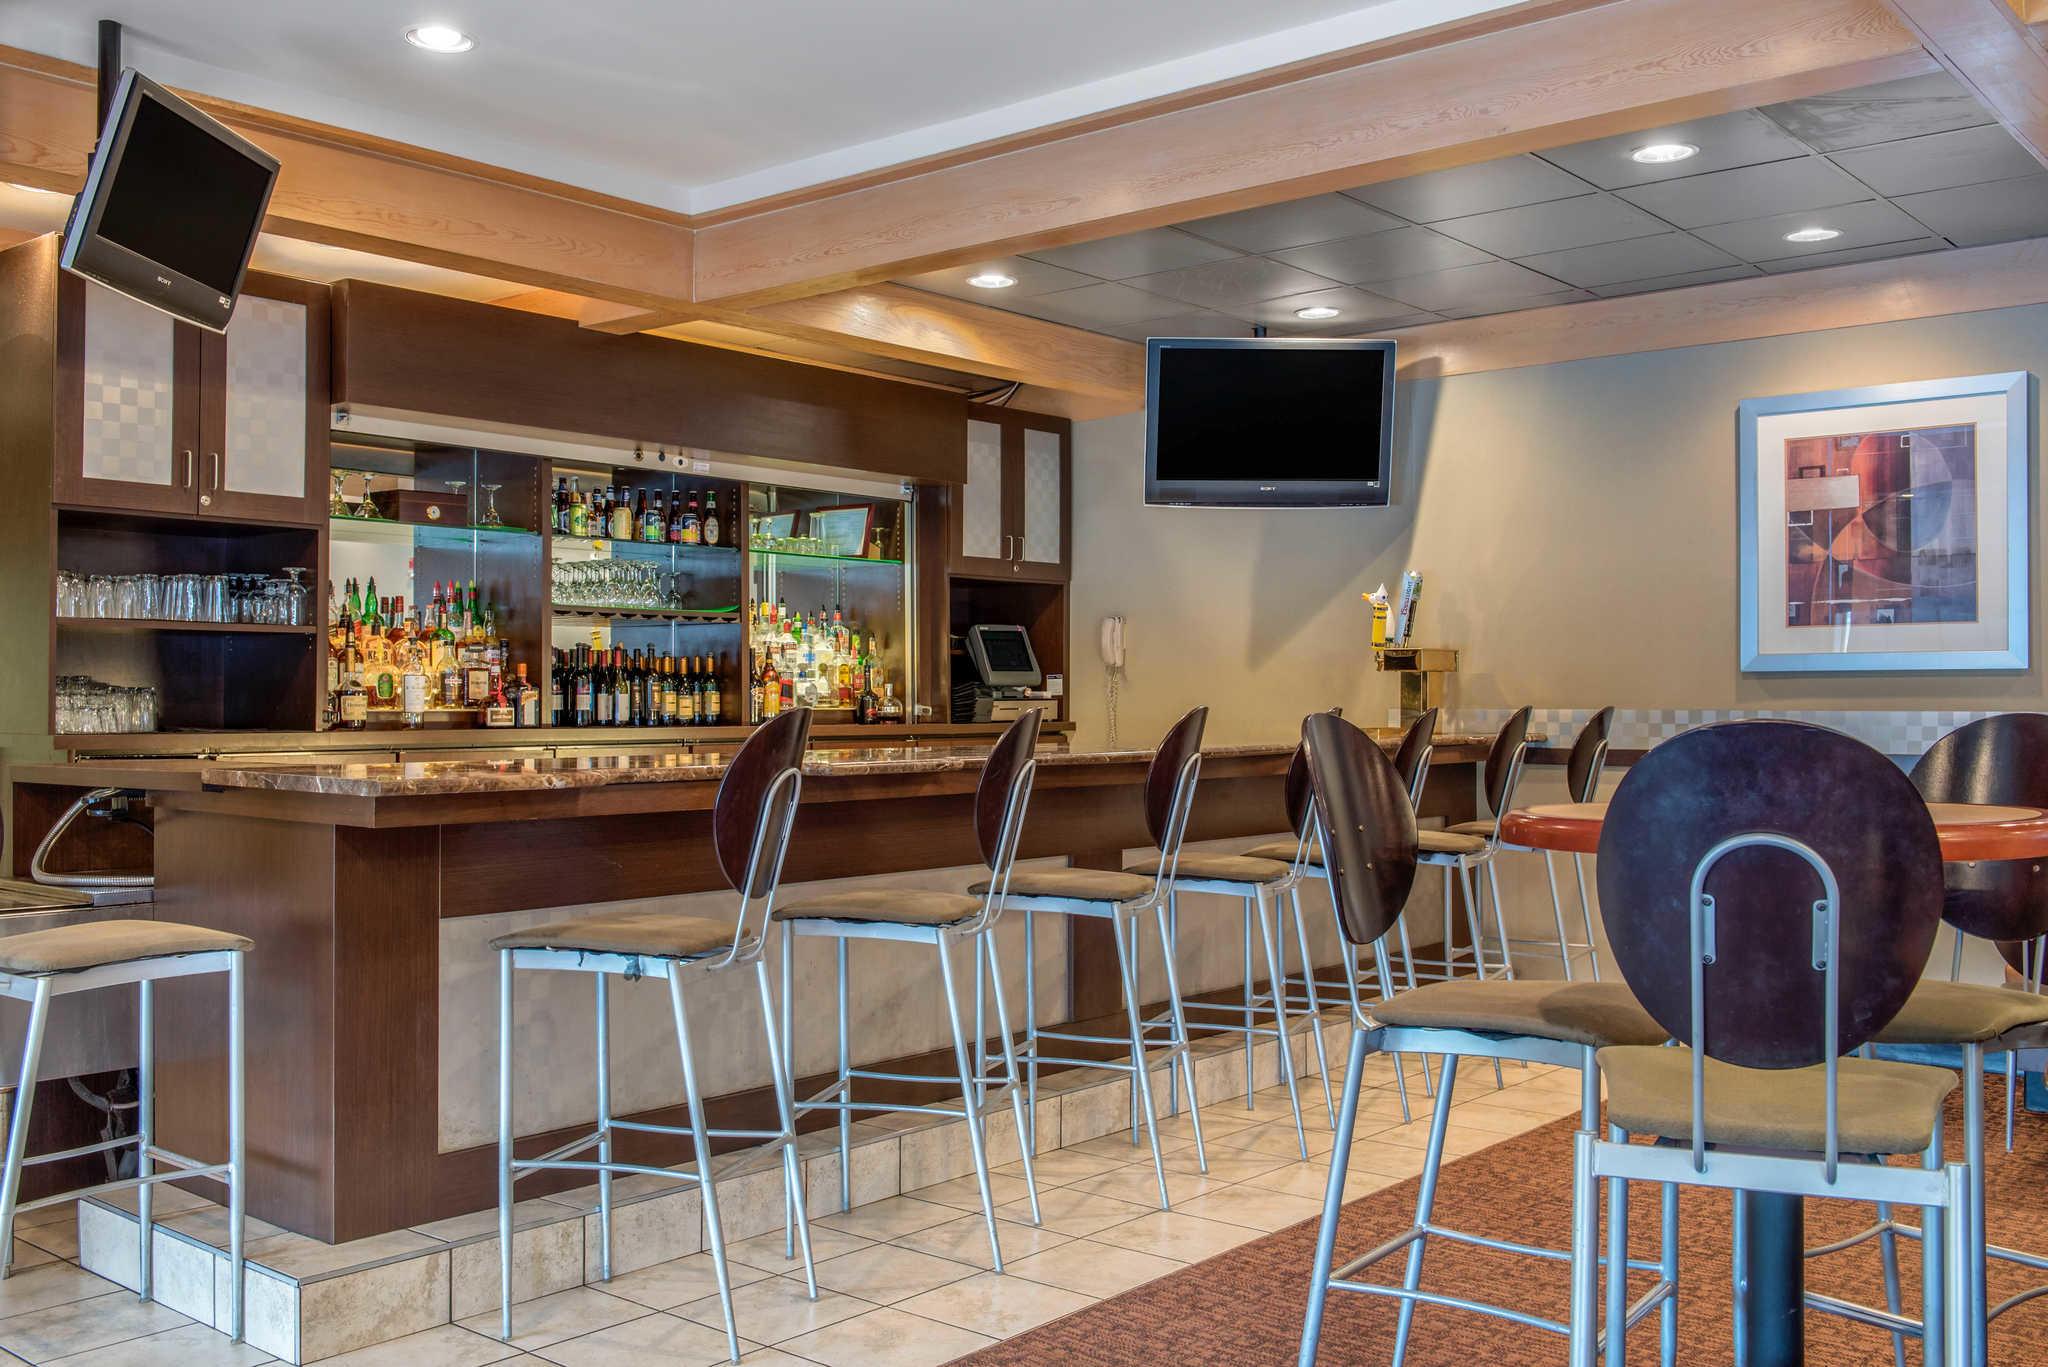 Quality Hotel - Cincinnati Blue Ash image 40